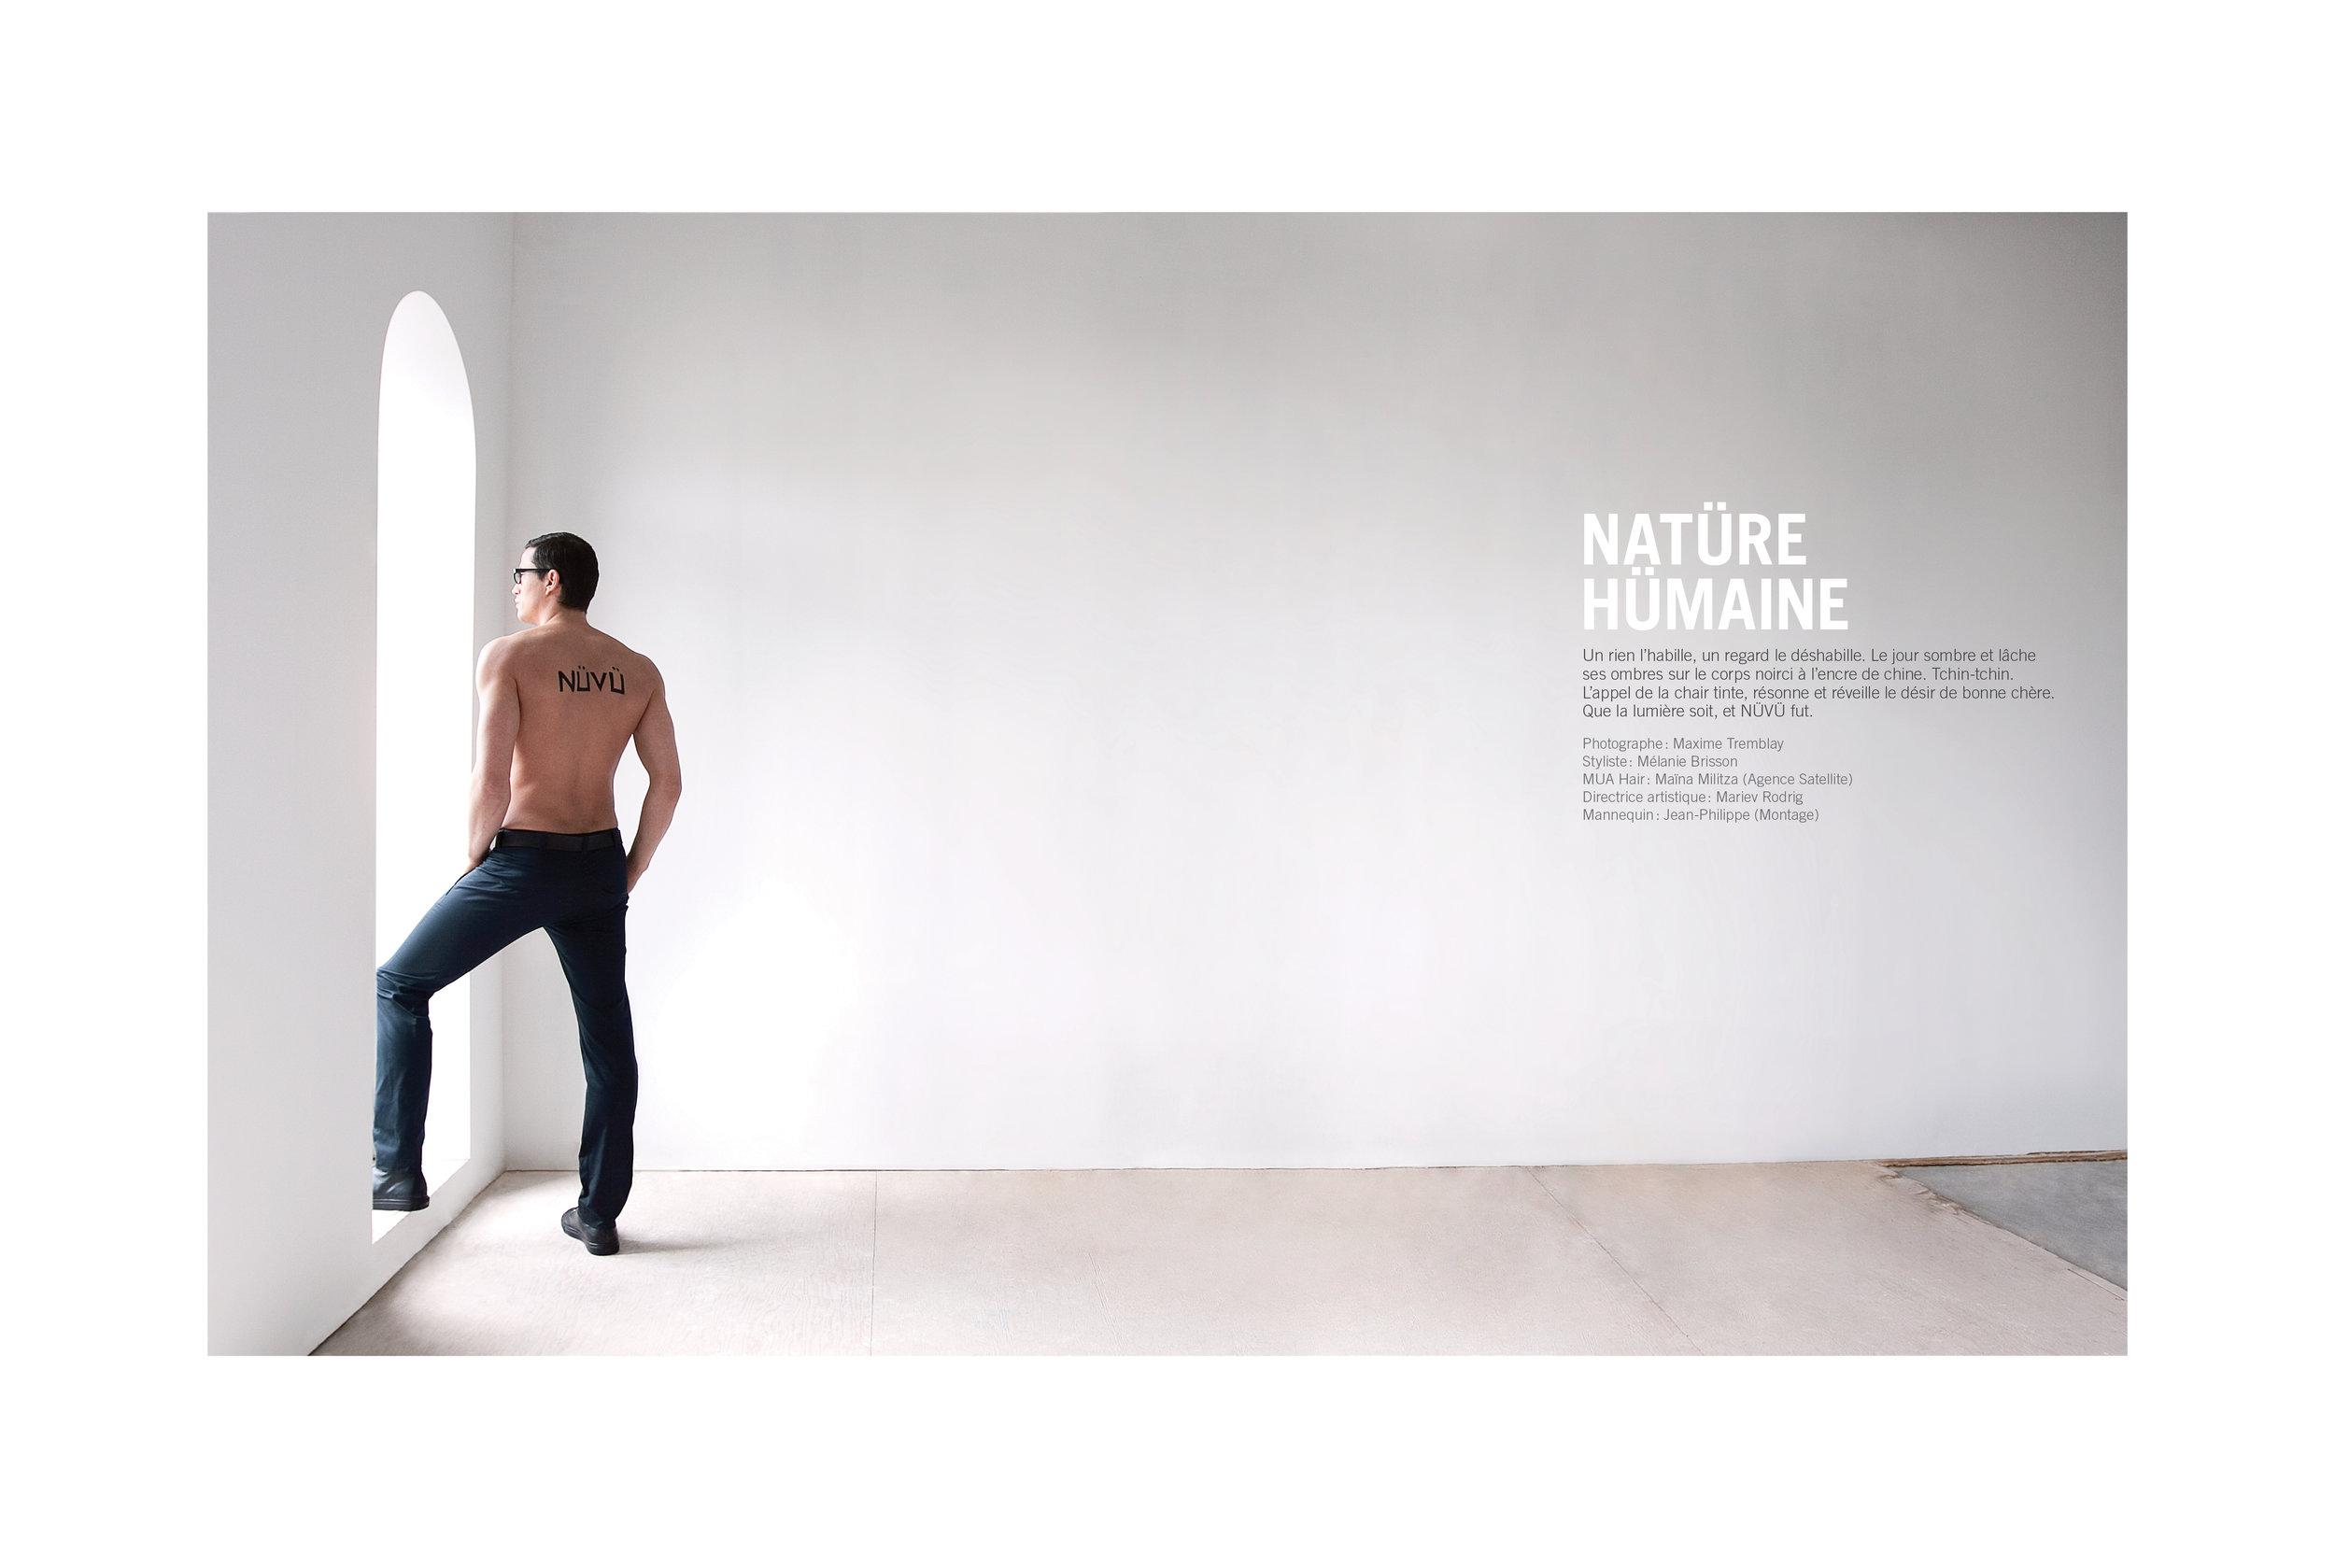 NUVU_0257_magazine_PRINT_HR6.jpg